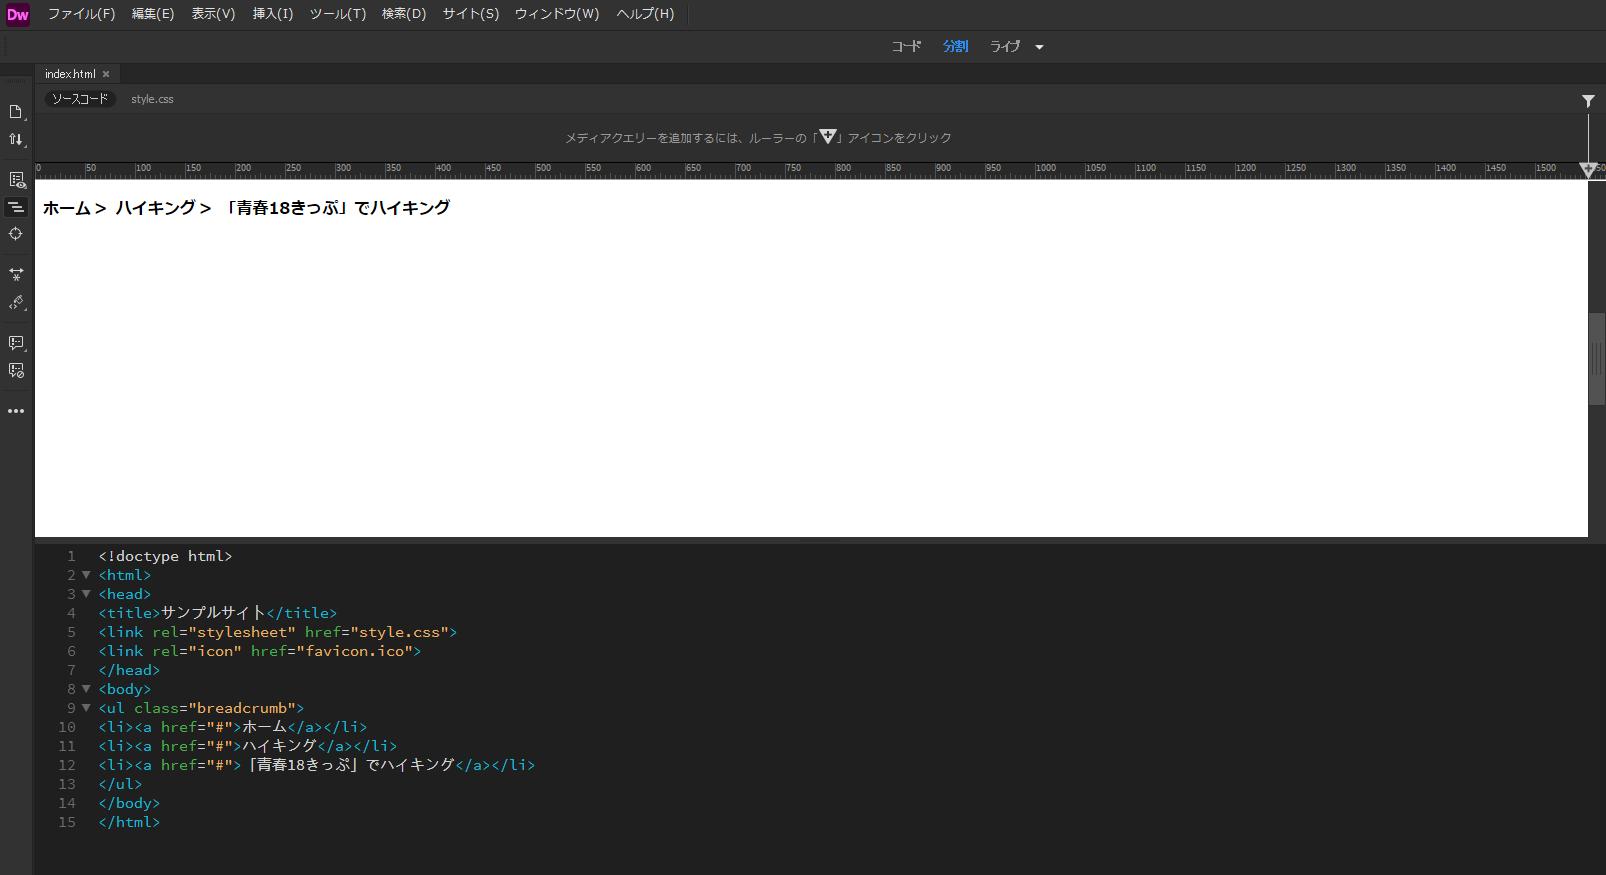 DreamweaverでWebサイトを作る